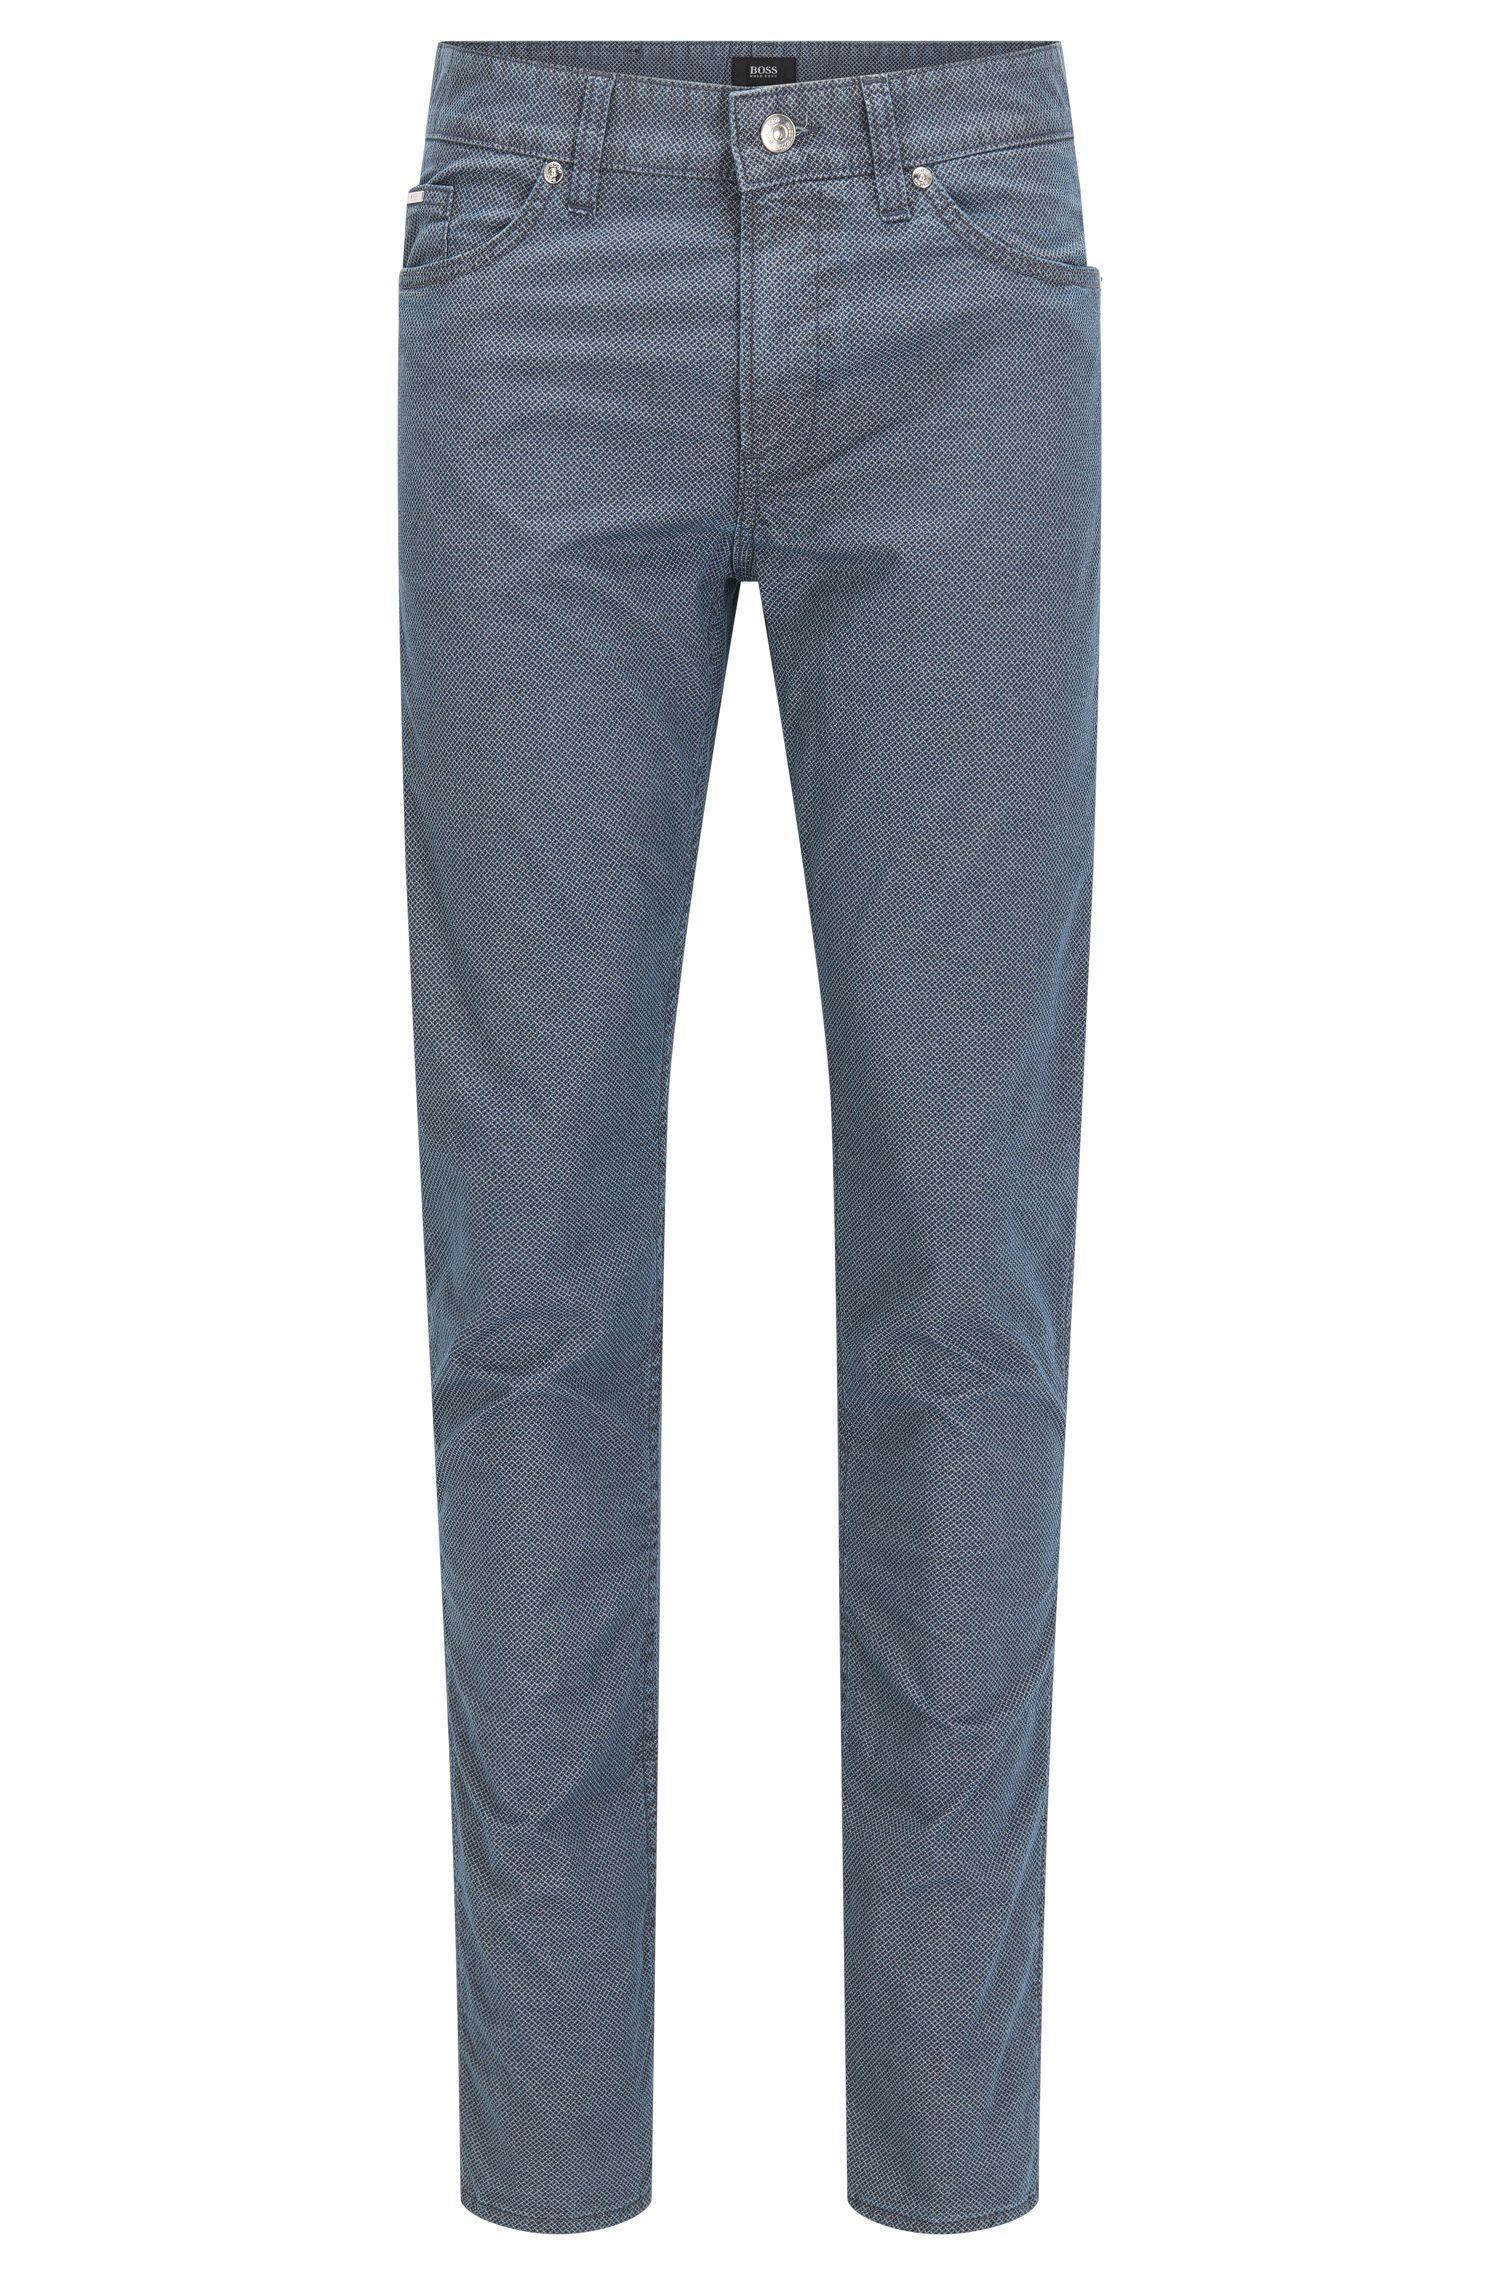 'Delaware' | Slim Fit, Geometric Stretch Cotton Jeans